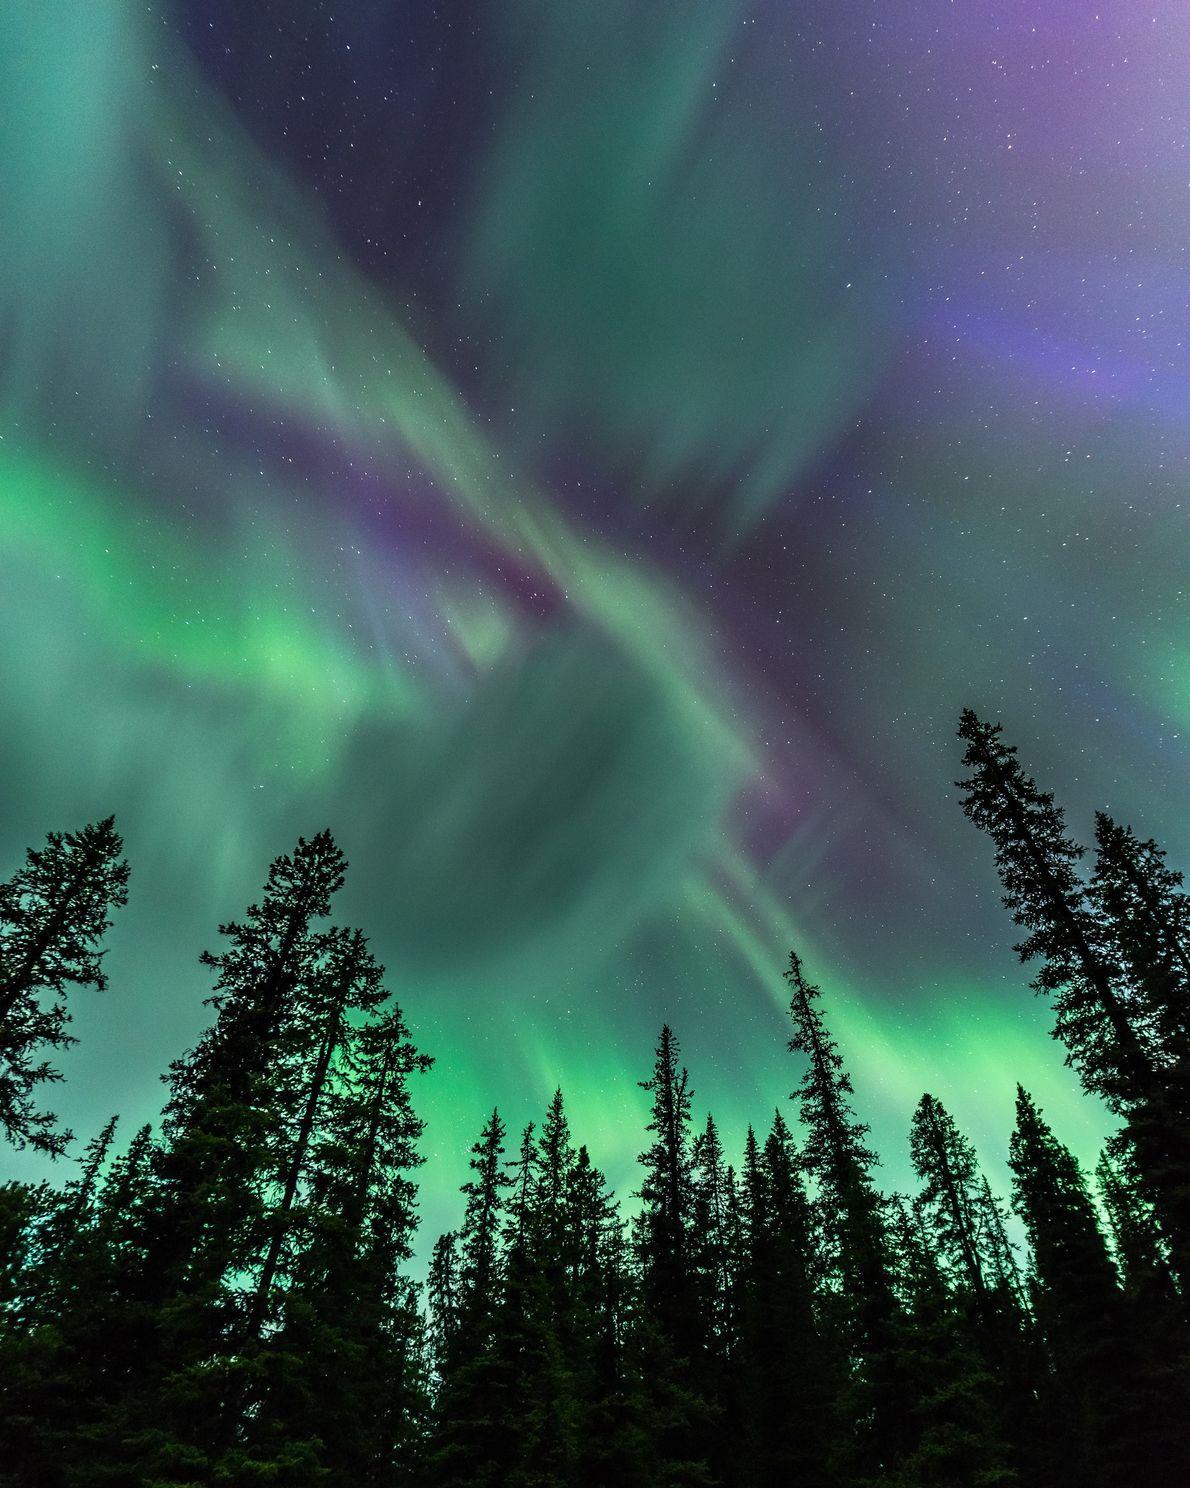 Northern lights soar above the trees near Spirit Island, on Maligne Lake, in Jasper National Park.